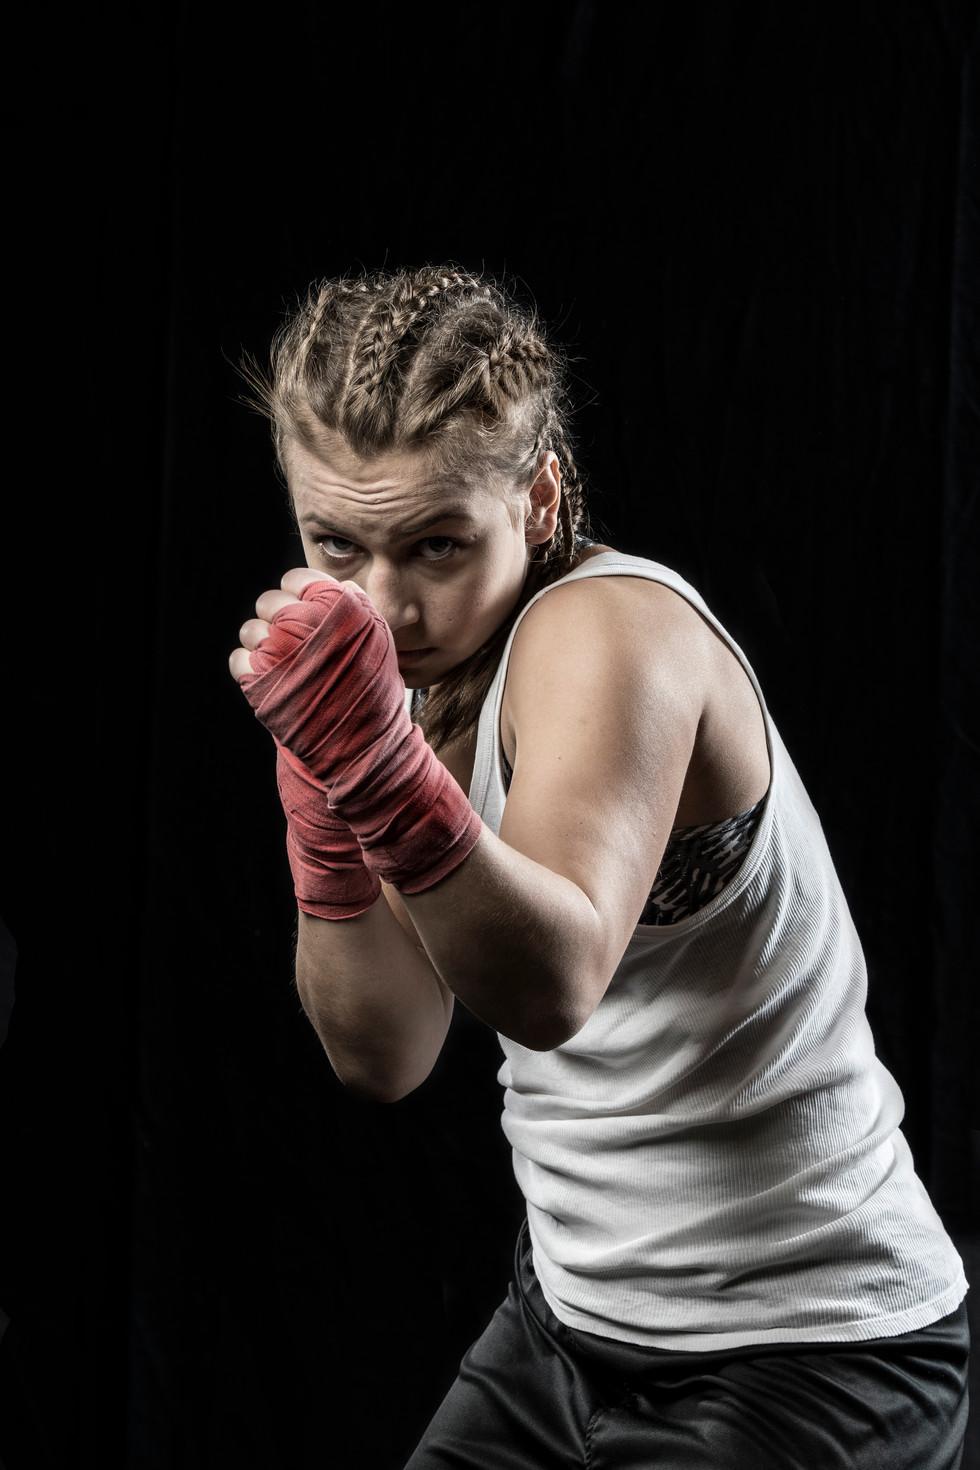 Sportfotografie-Boxen-Boxerin-18.jpg